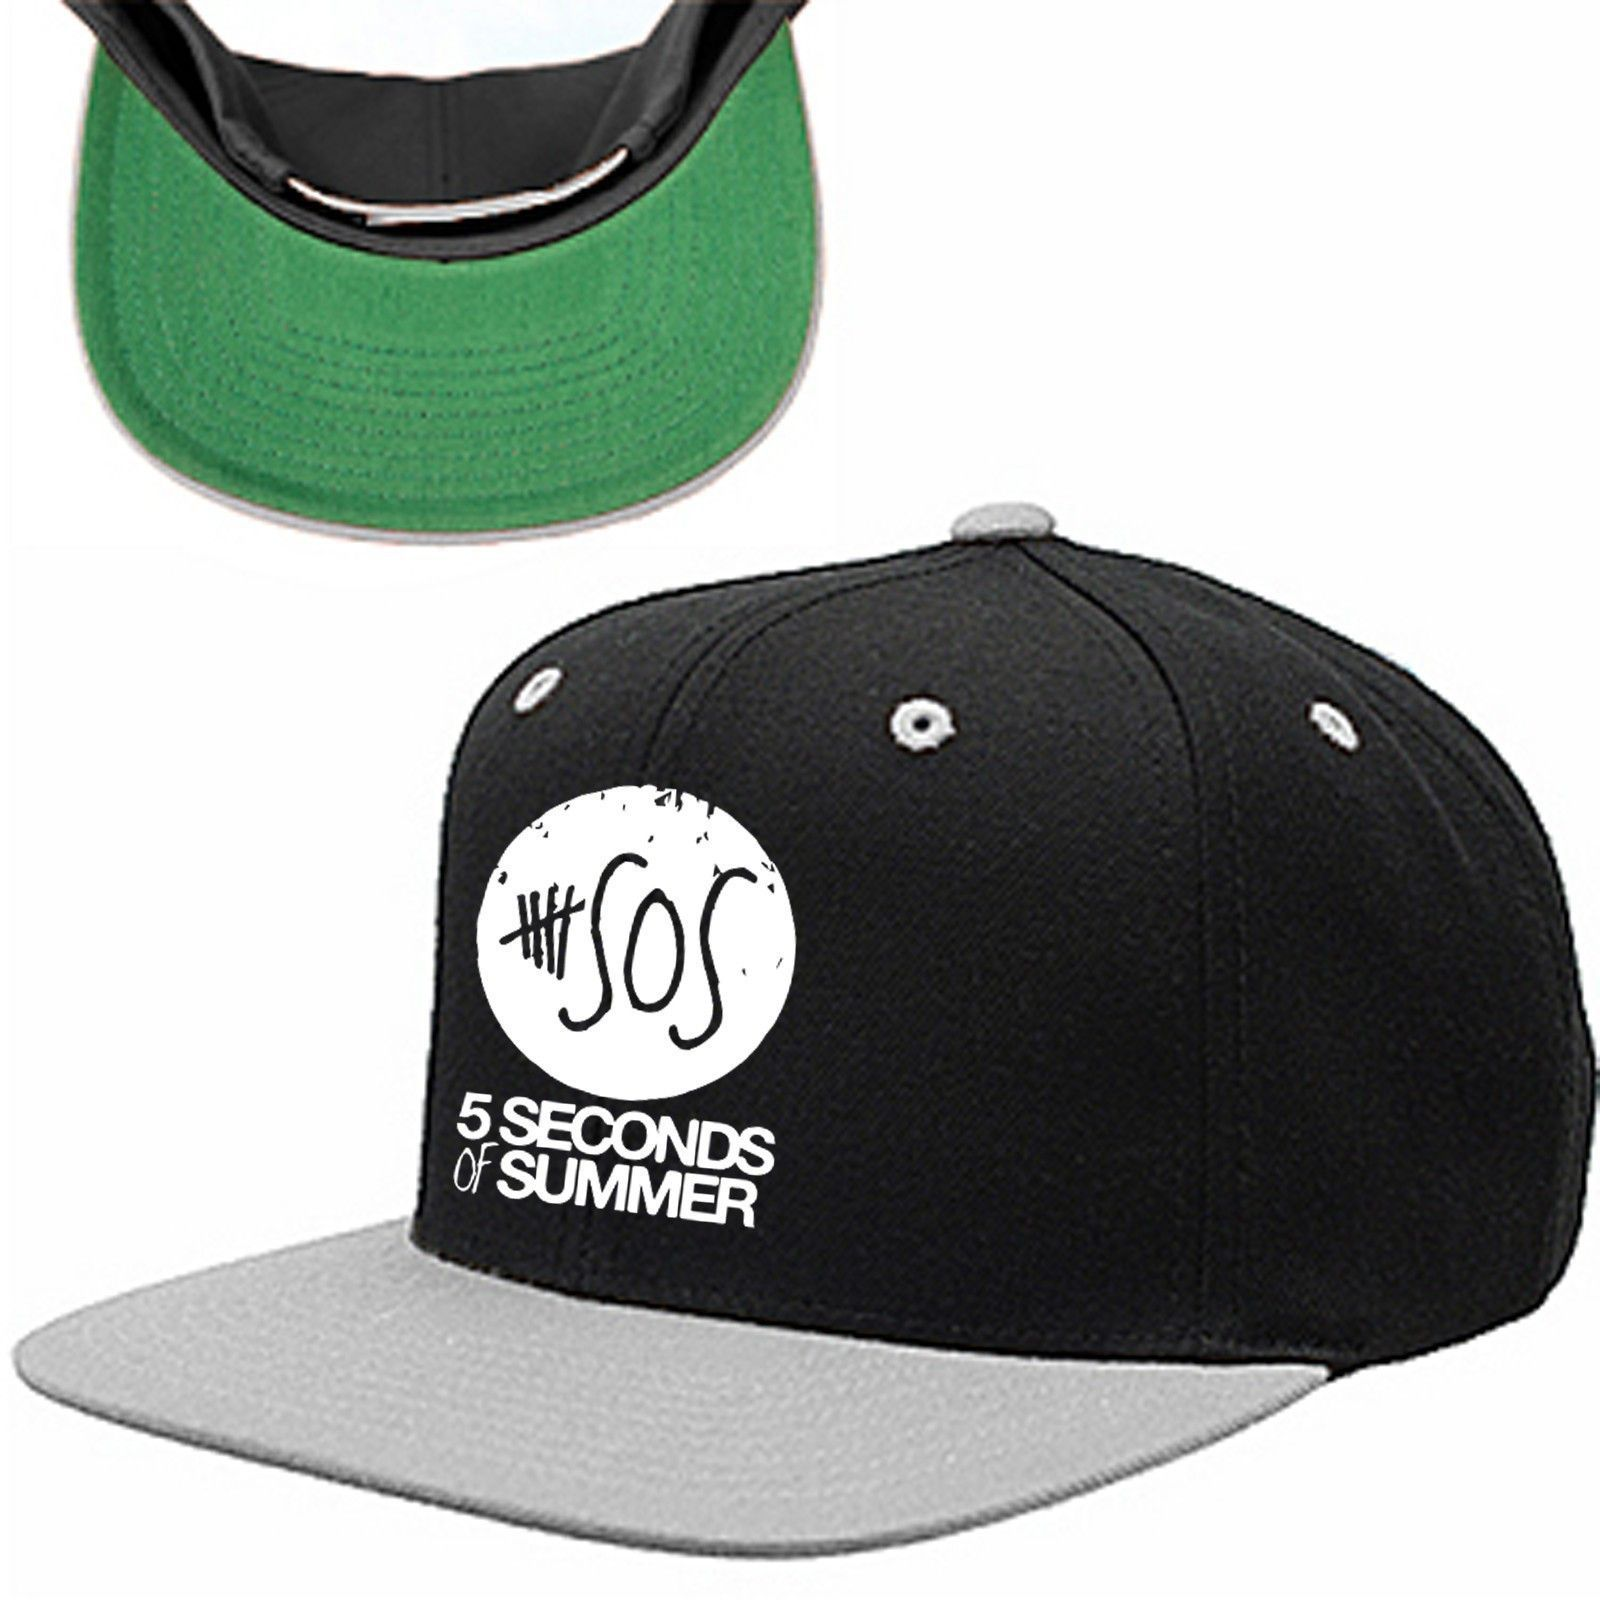 5 Seconds of Summer Snapback Hat